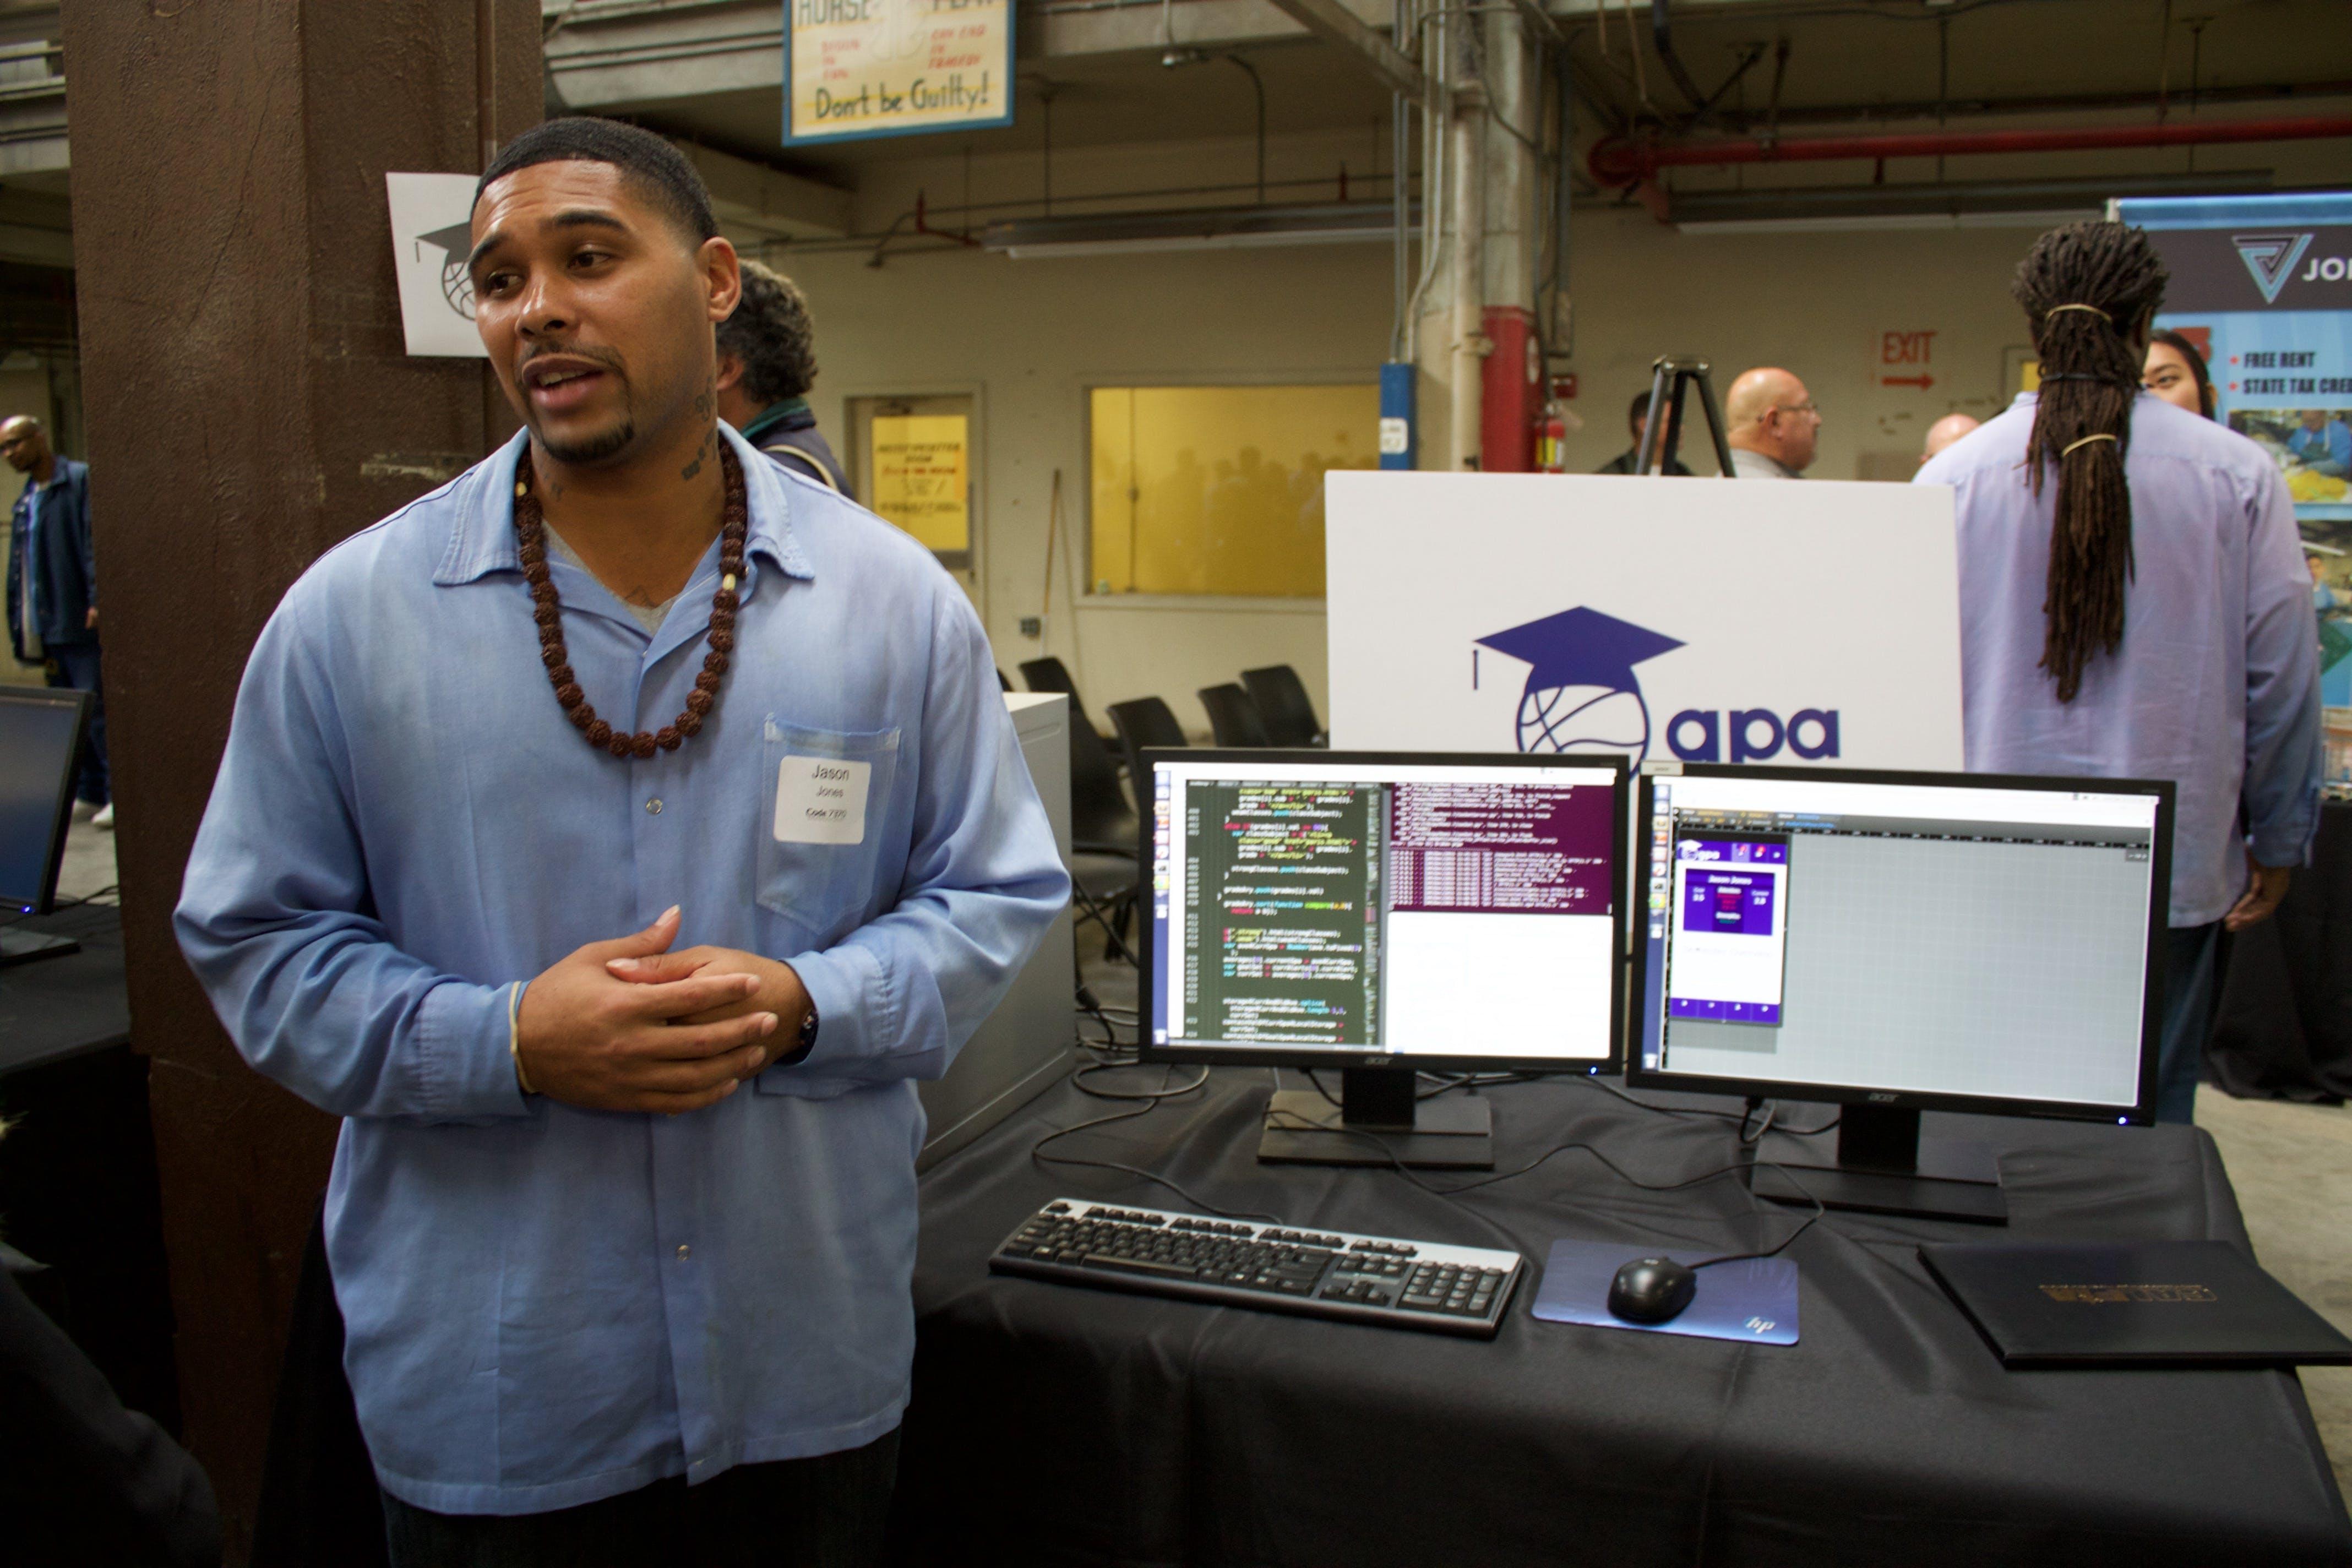 Jason Jones demoes GPA to visitors.